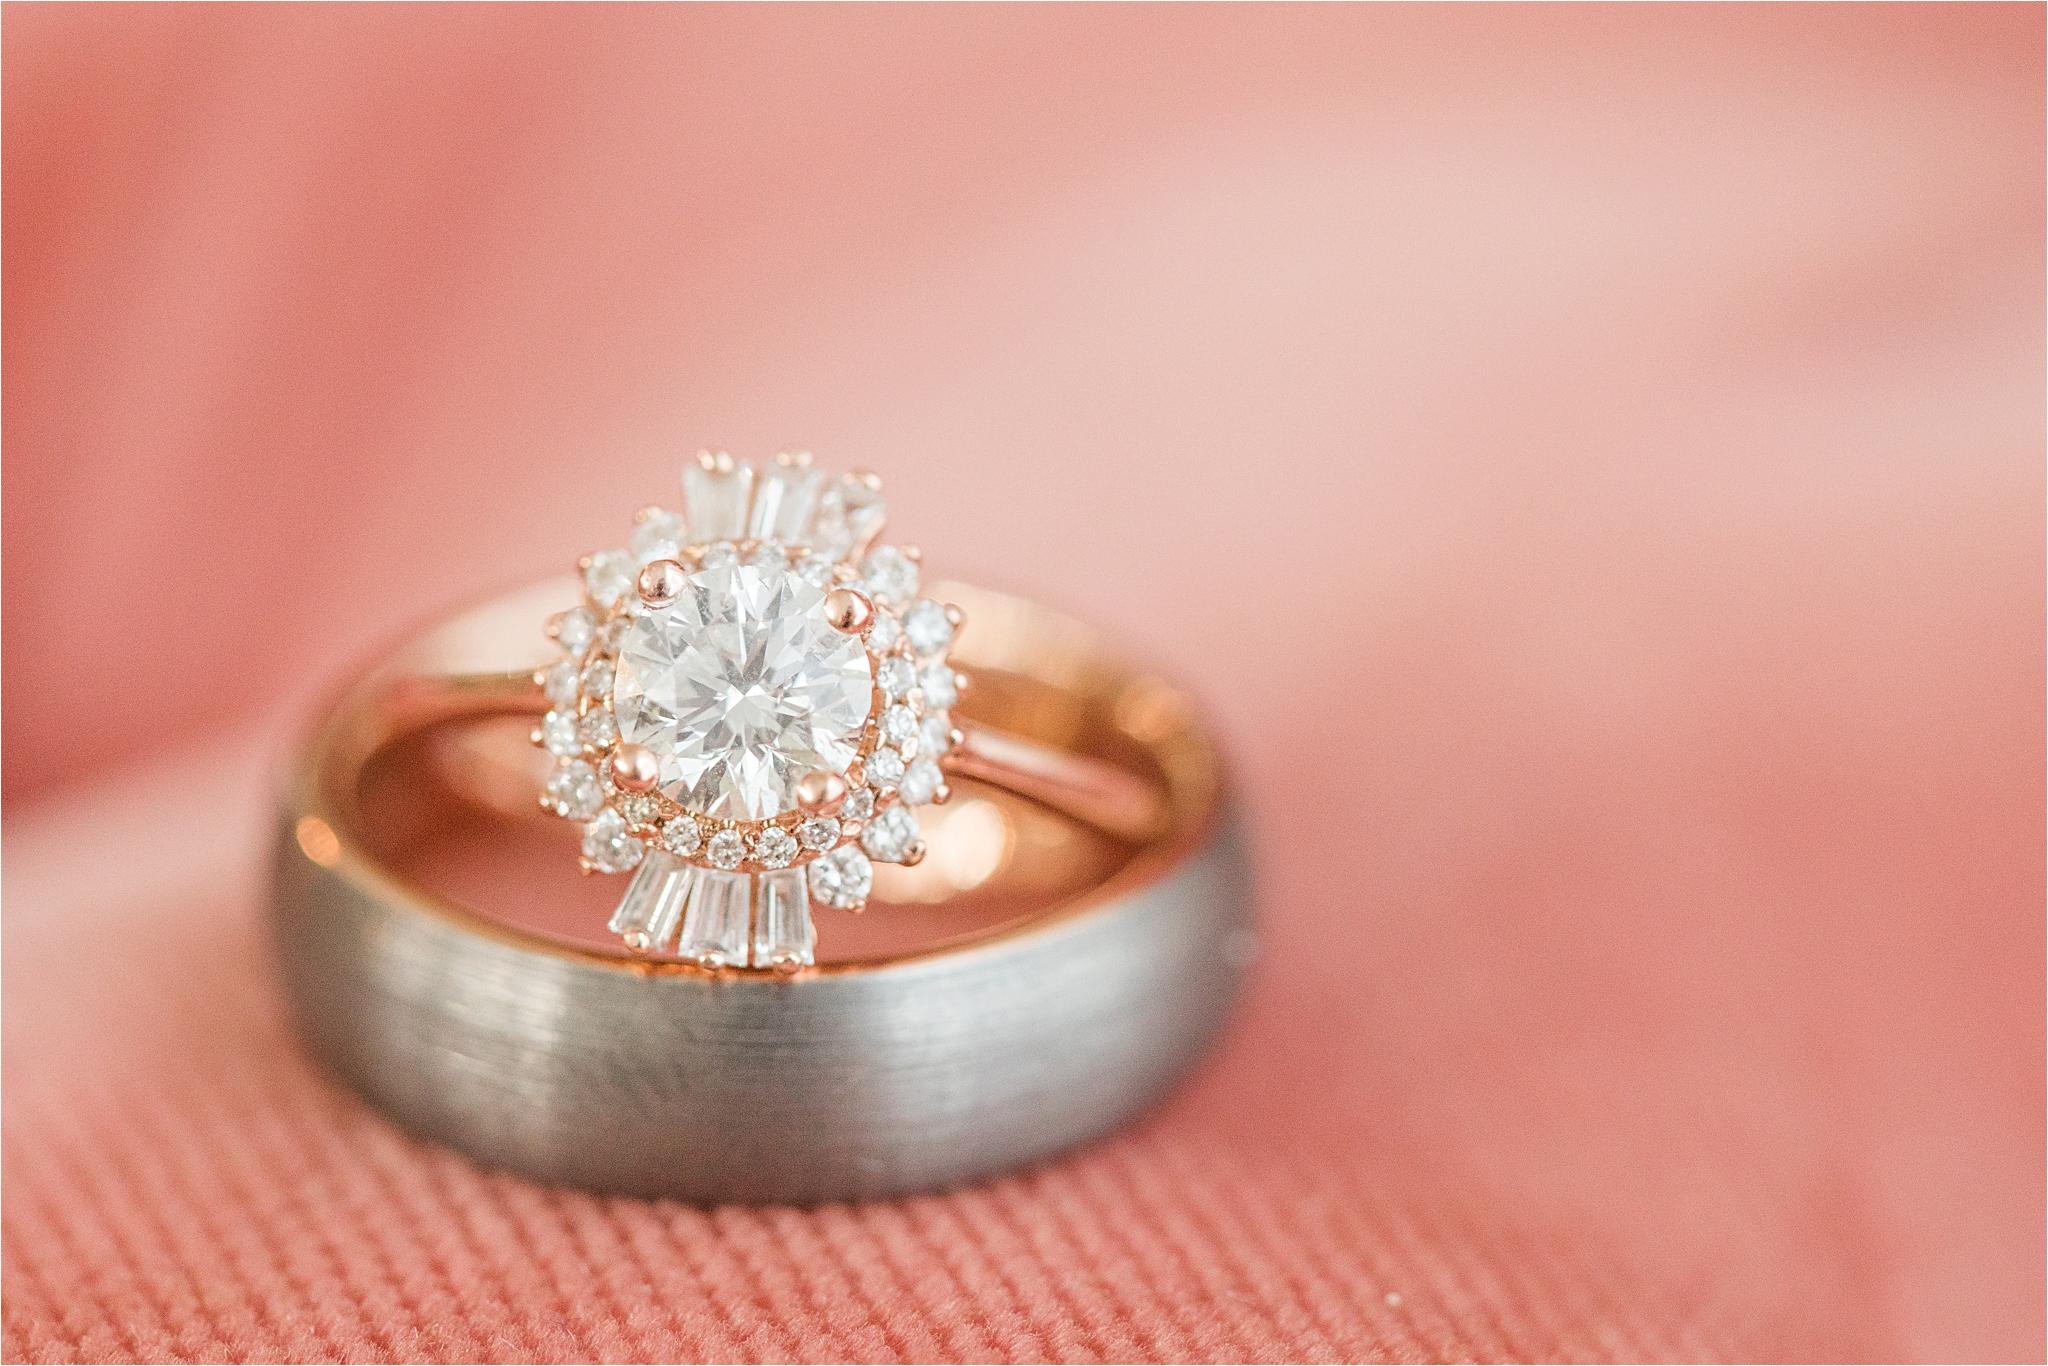 unique-engagement-ring-wedding-band-rose-gold-halo-ornate-oval